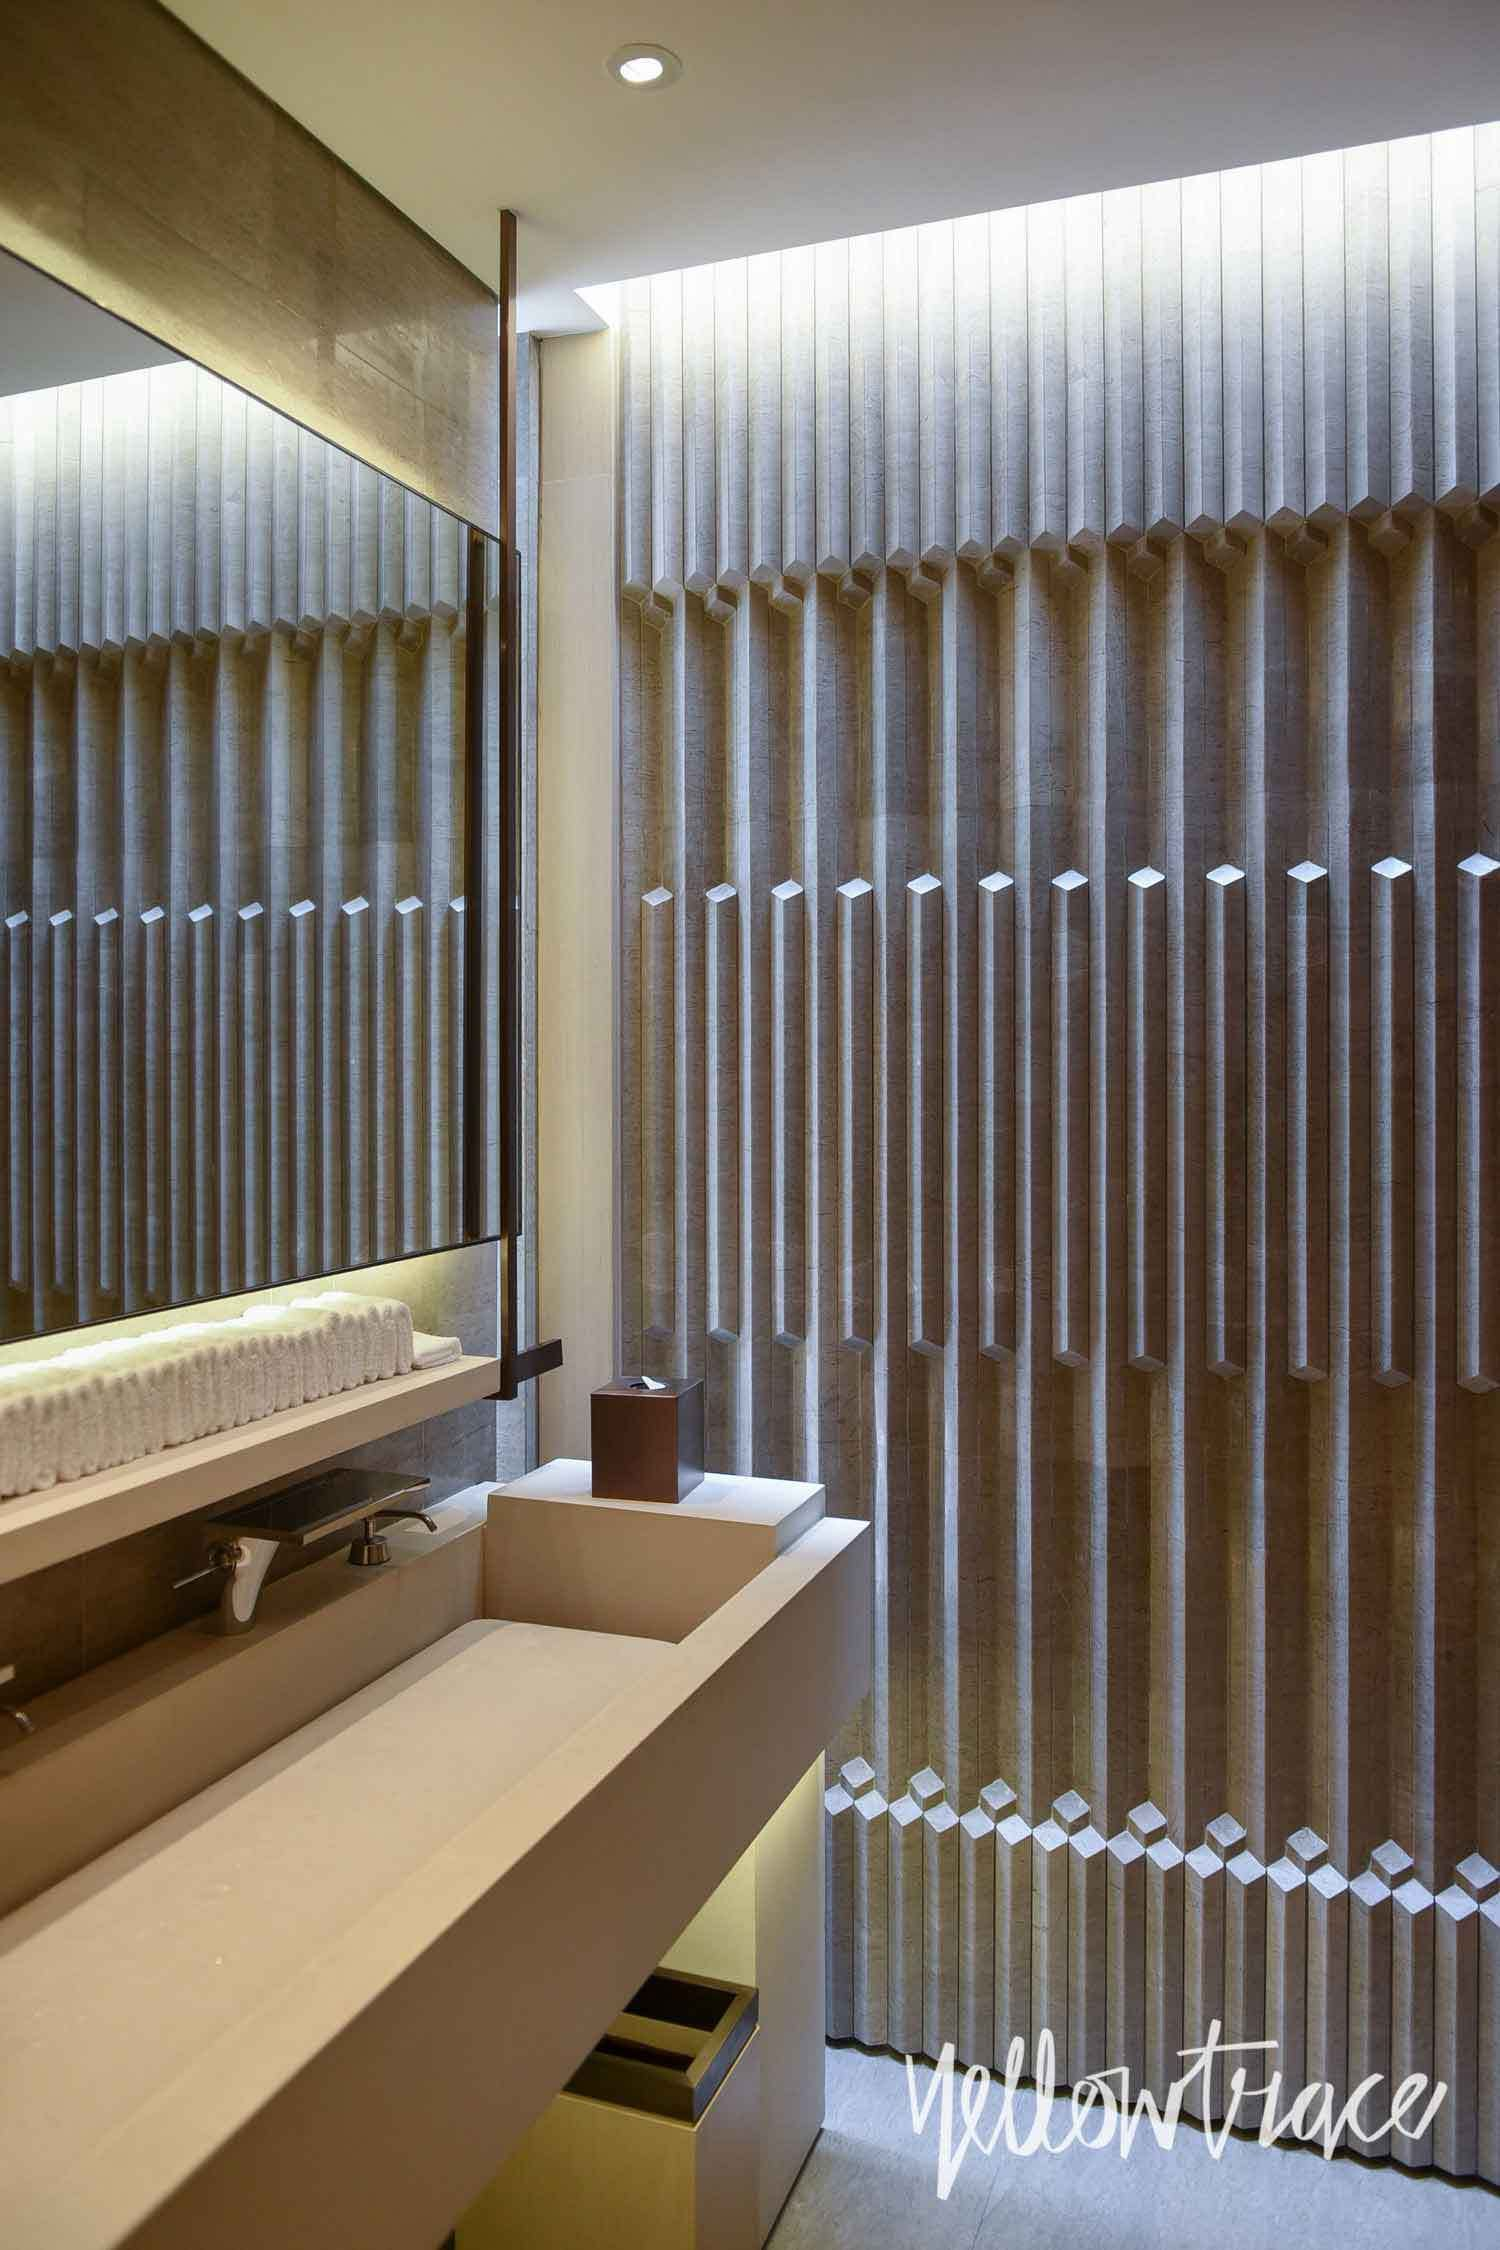 Explore Bathroom Interior Design And More The Upper House Hong Kong